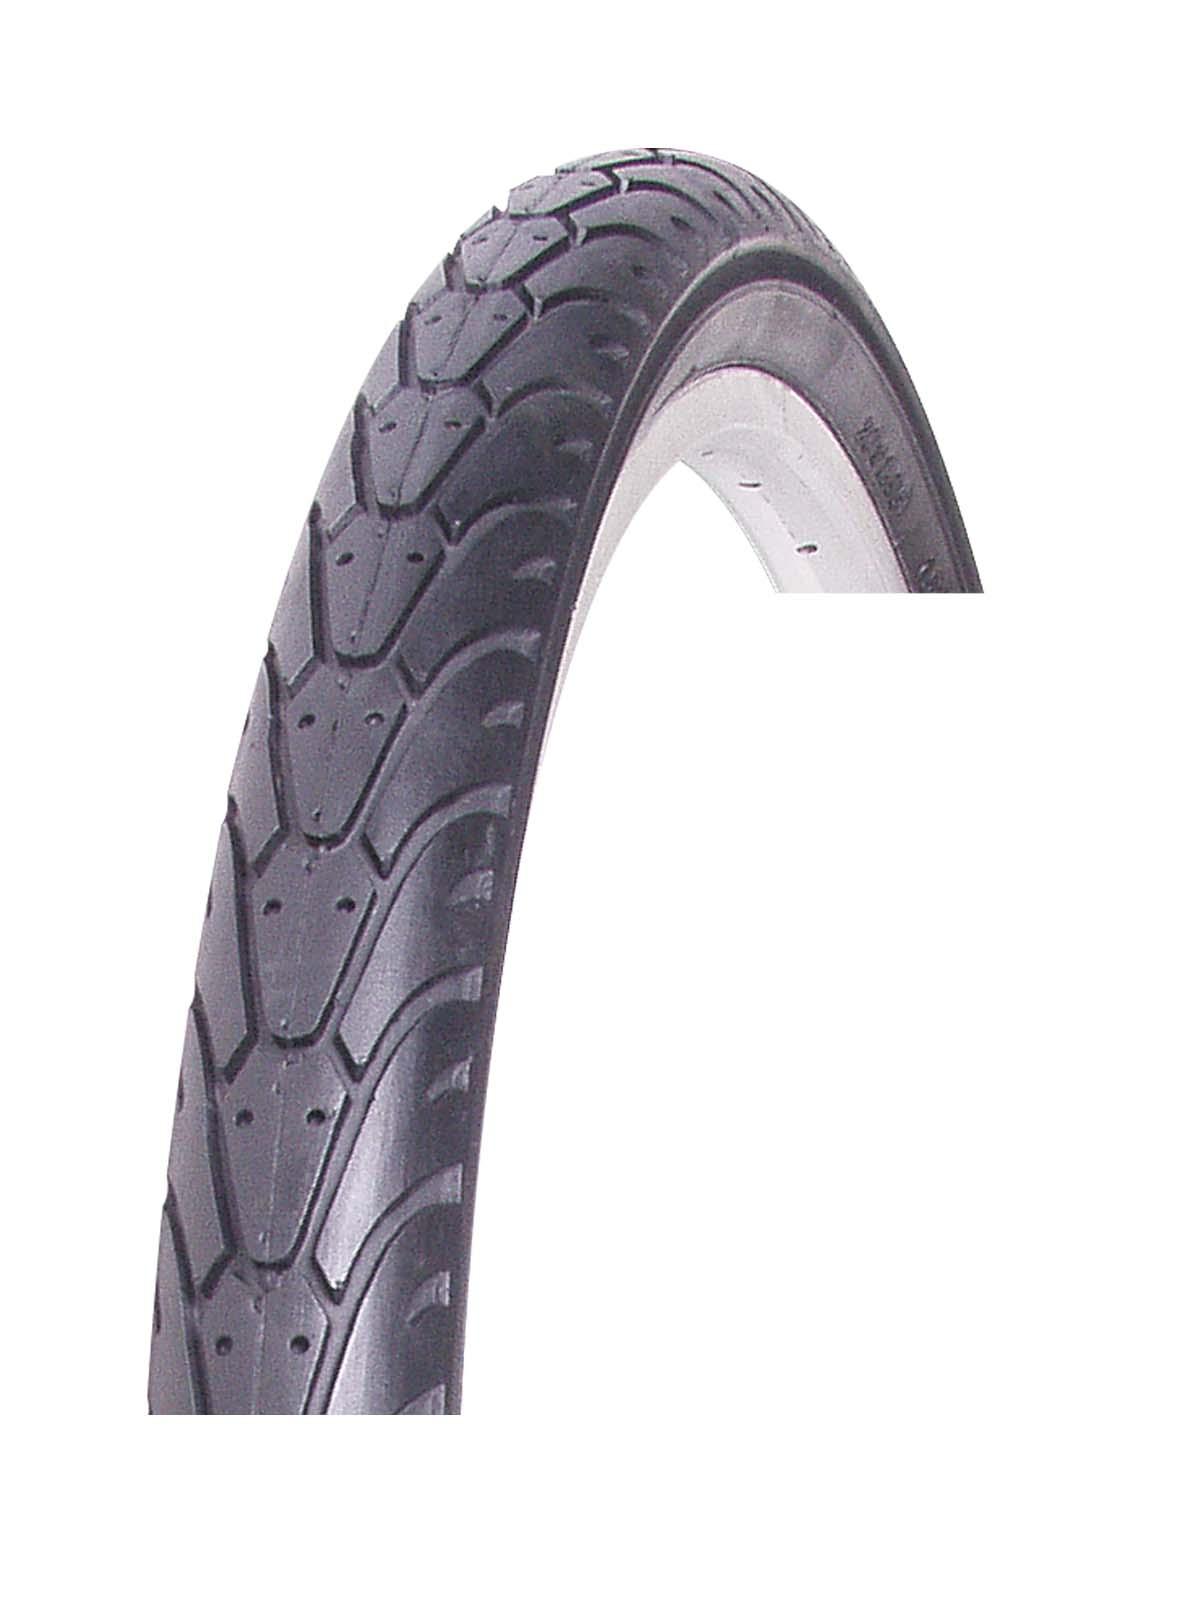 VEE RUBBER - Външна гума Vee Rubber 18x1,75 VRB212